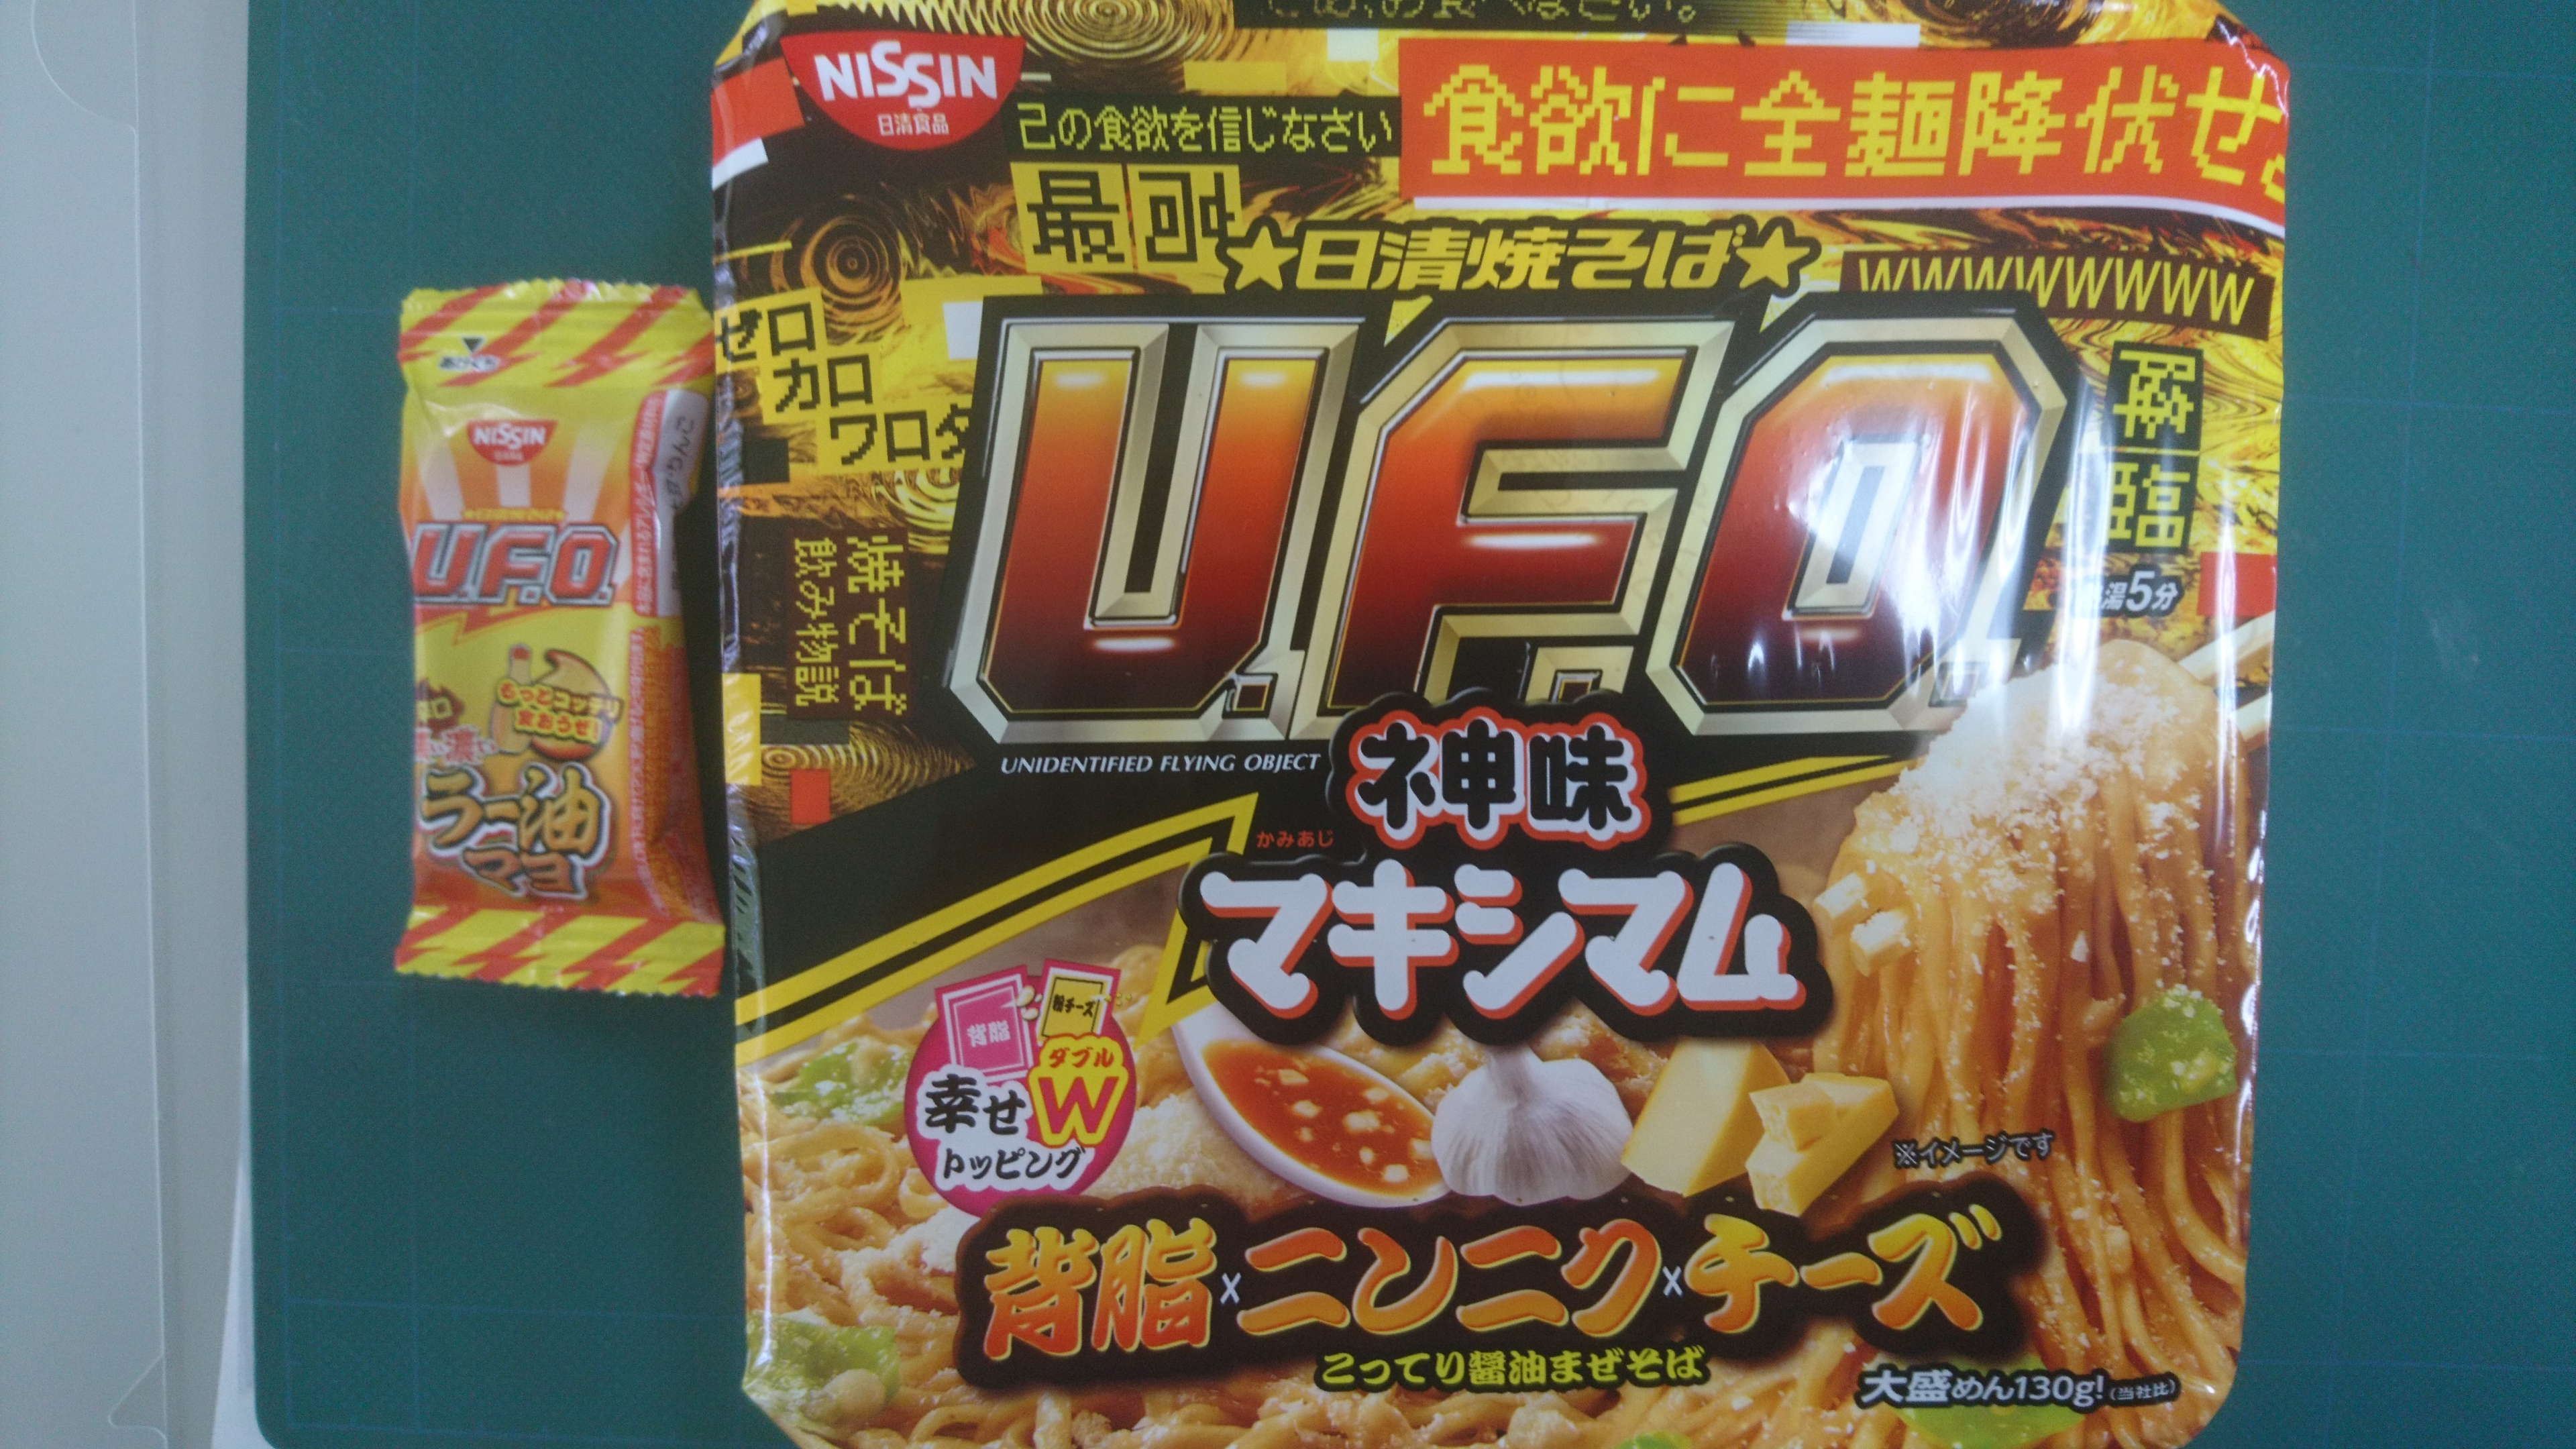 UFOやきそば 神味マキシマム 背脂とニンニクとチーズでどうなることやら。